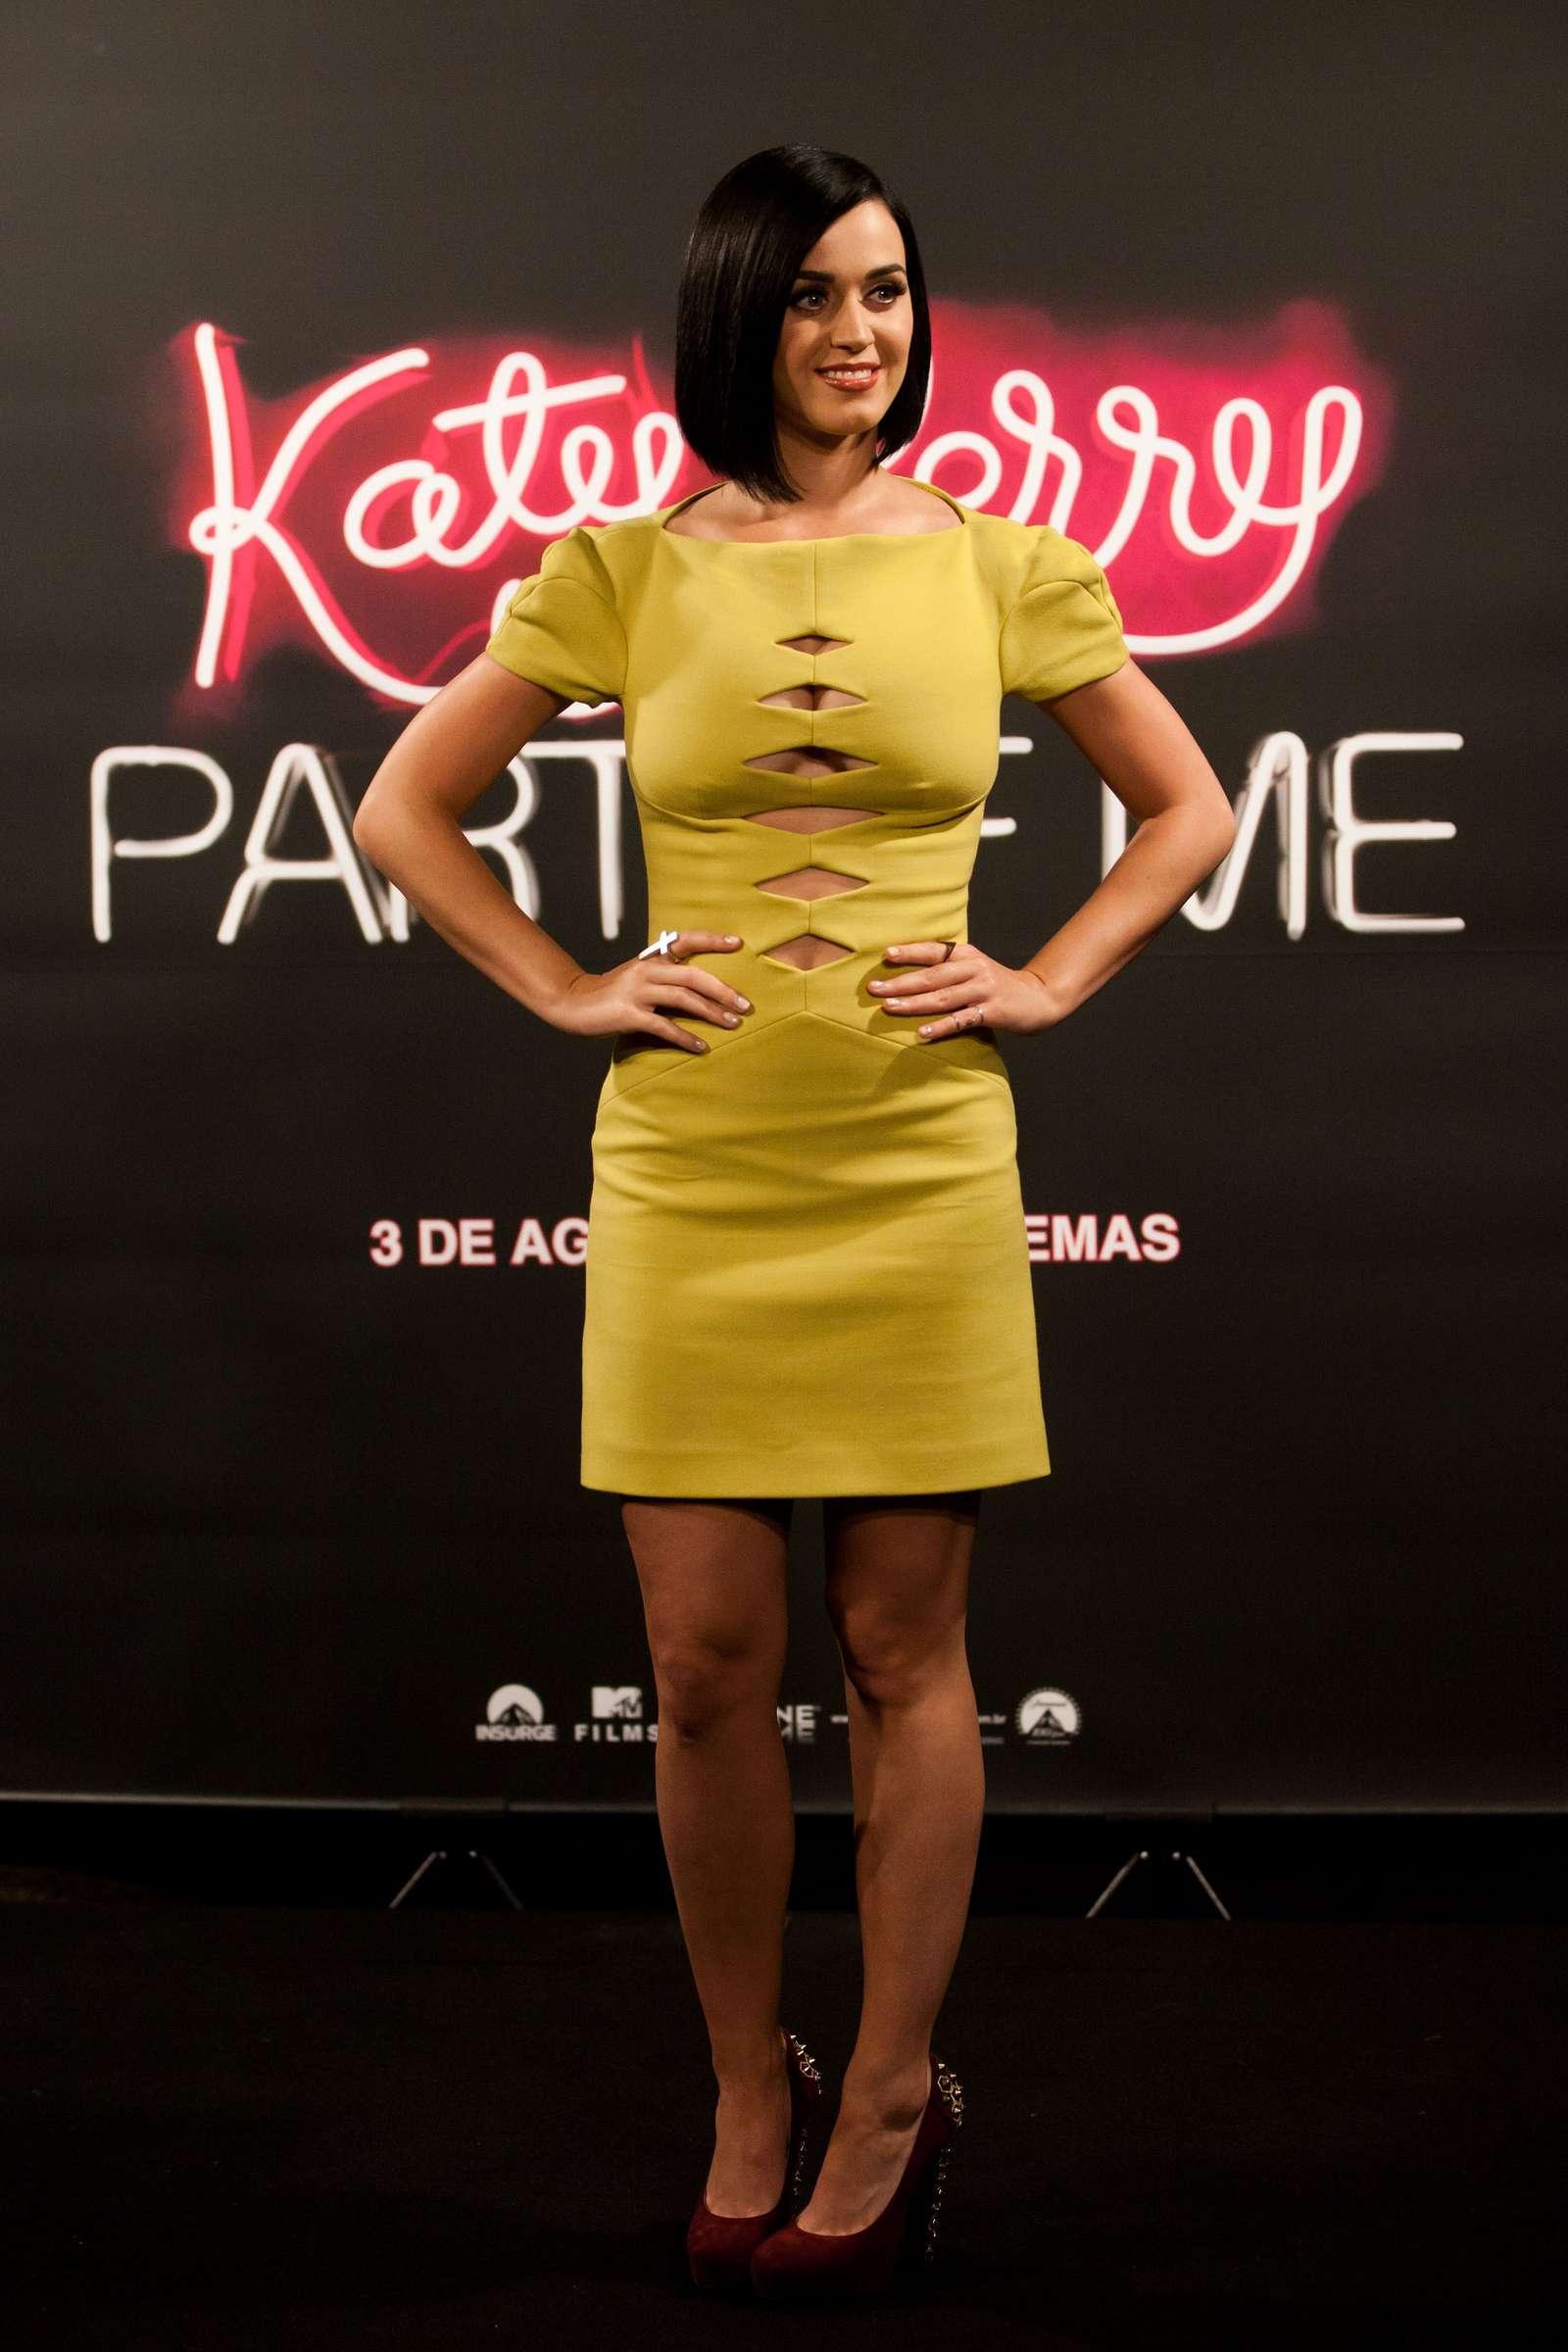 Katy Perry 2012 : katy-perry-photocall-part-of-me-in-rio-de-janeiro-19